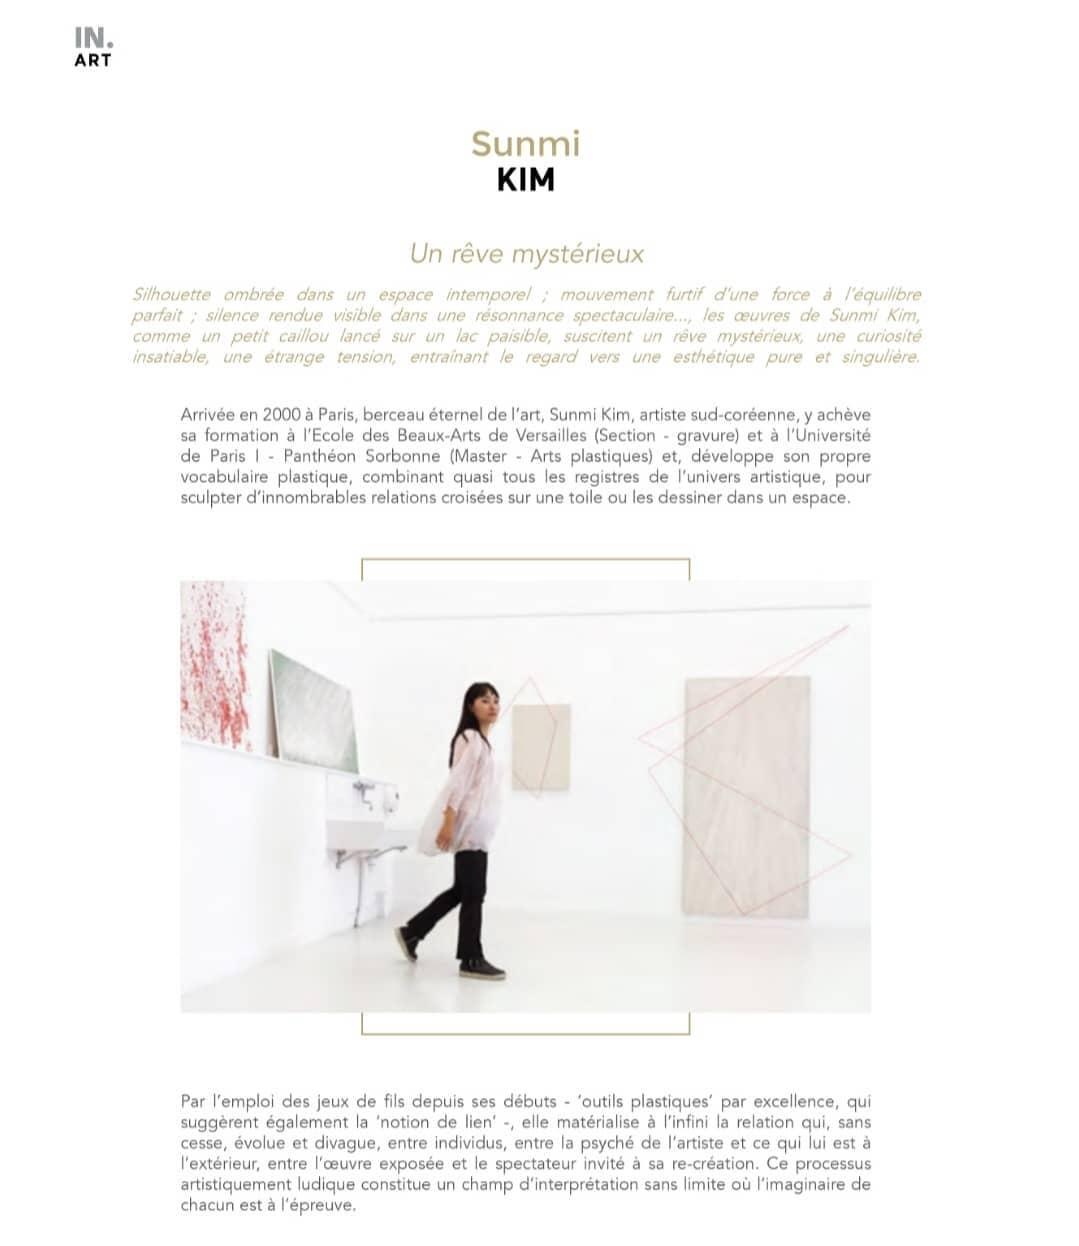 SUNMI KIM, UN RÊVE MYSTÉRIEUX, IN.LuxuryParis 2021